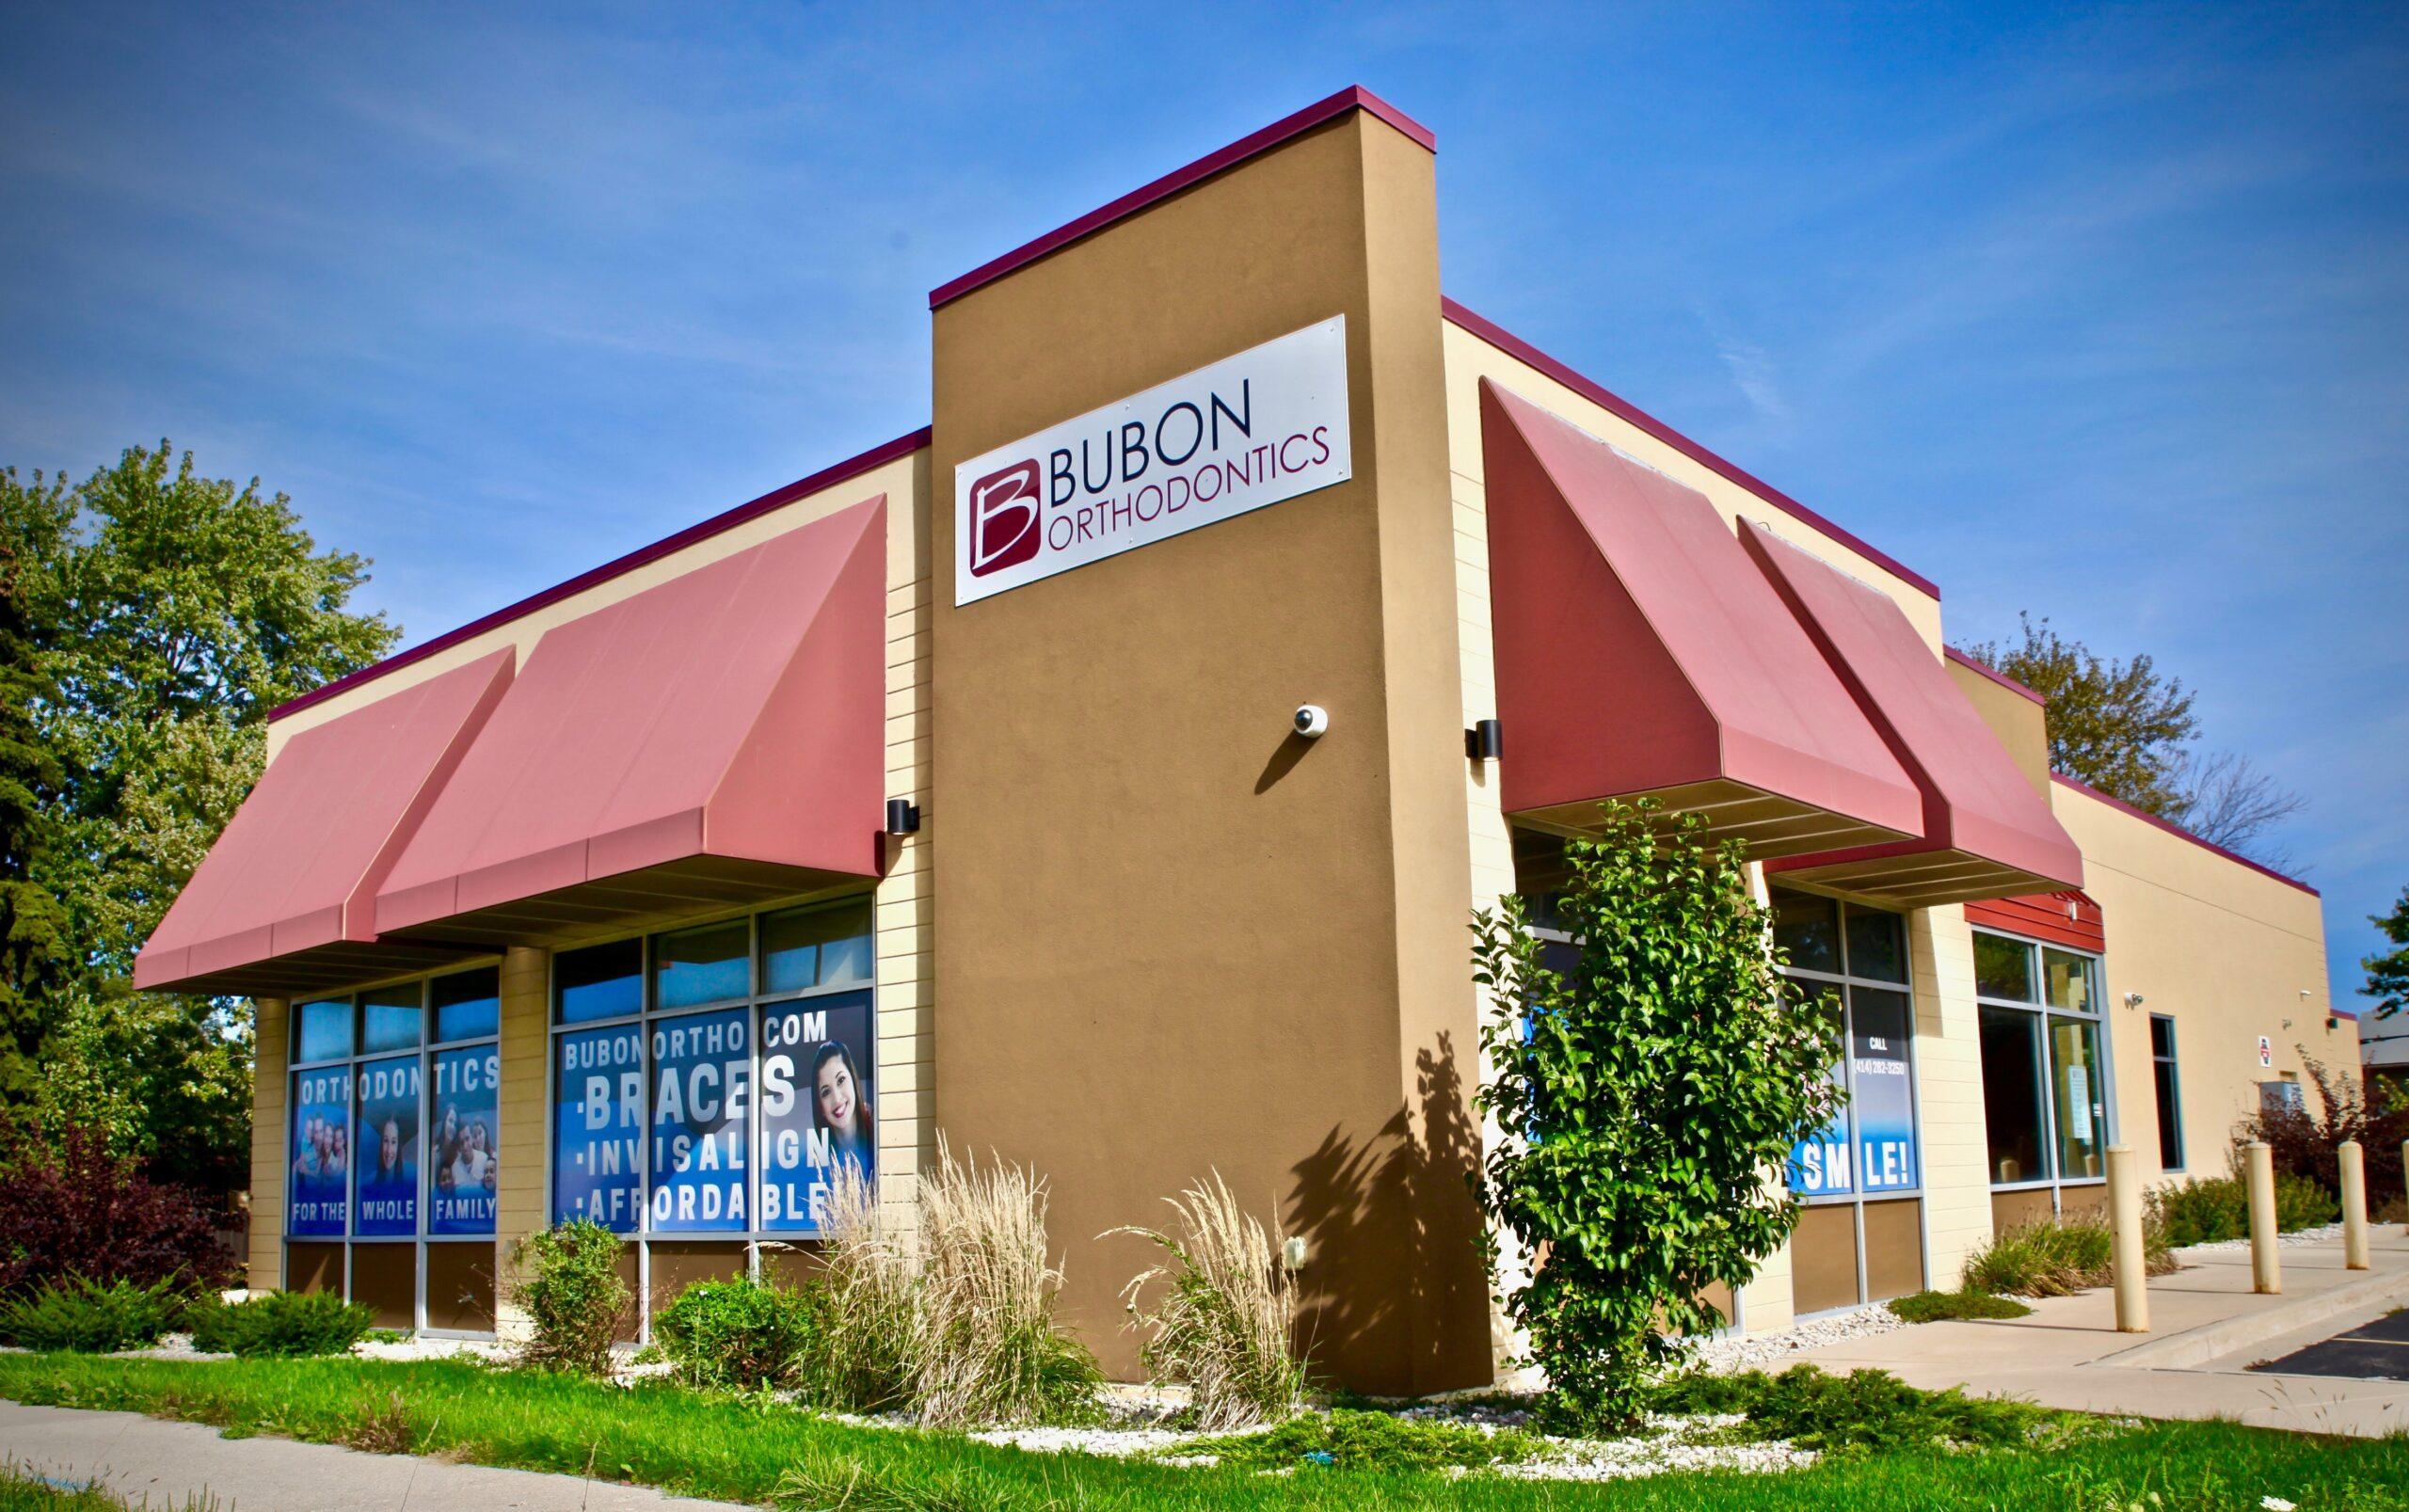 WISCONSIN - Milwaukee orthodontic practice has office space